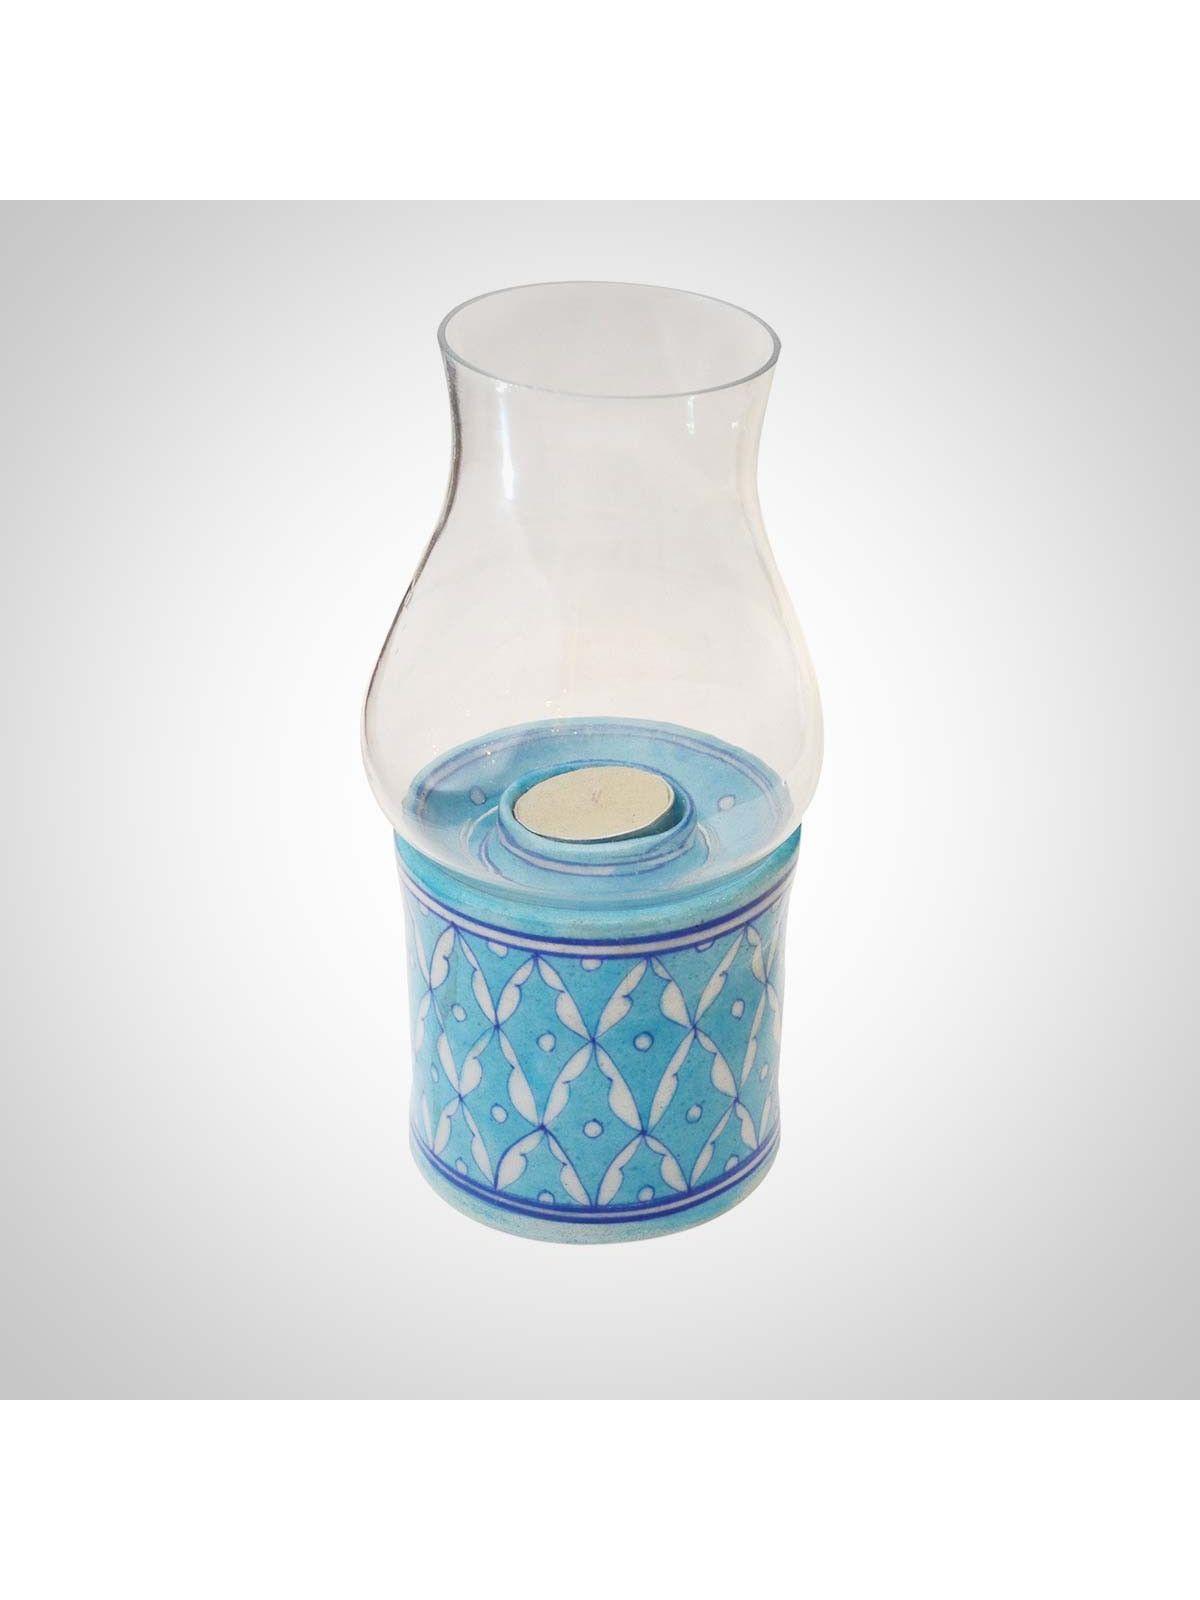 Sky Blue Ceramic & Glass Tea-Light Holder Chimney - 8.5 Inches Height